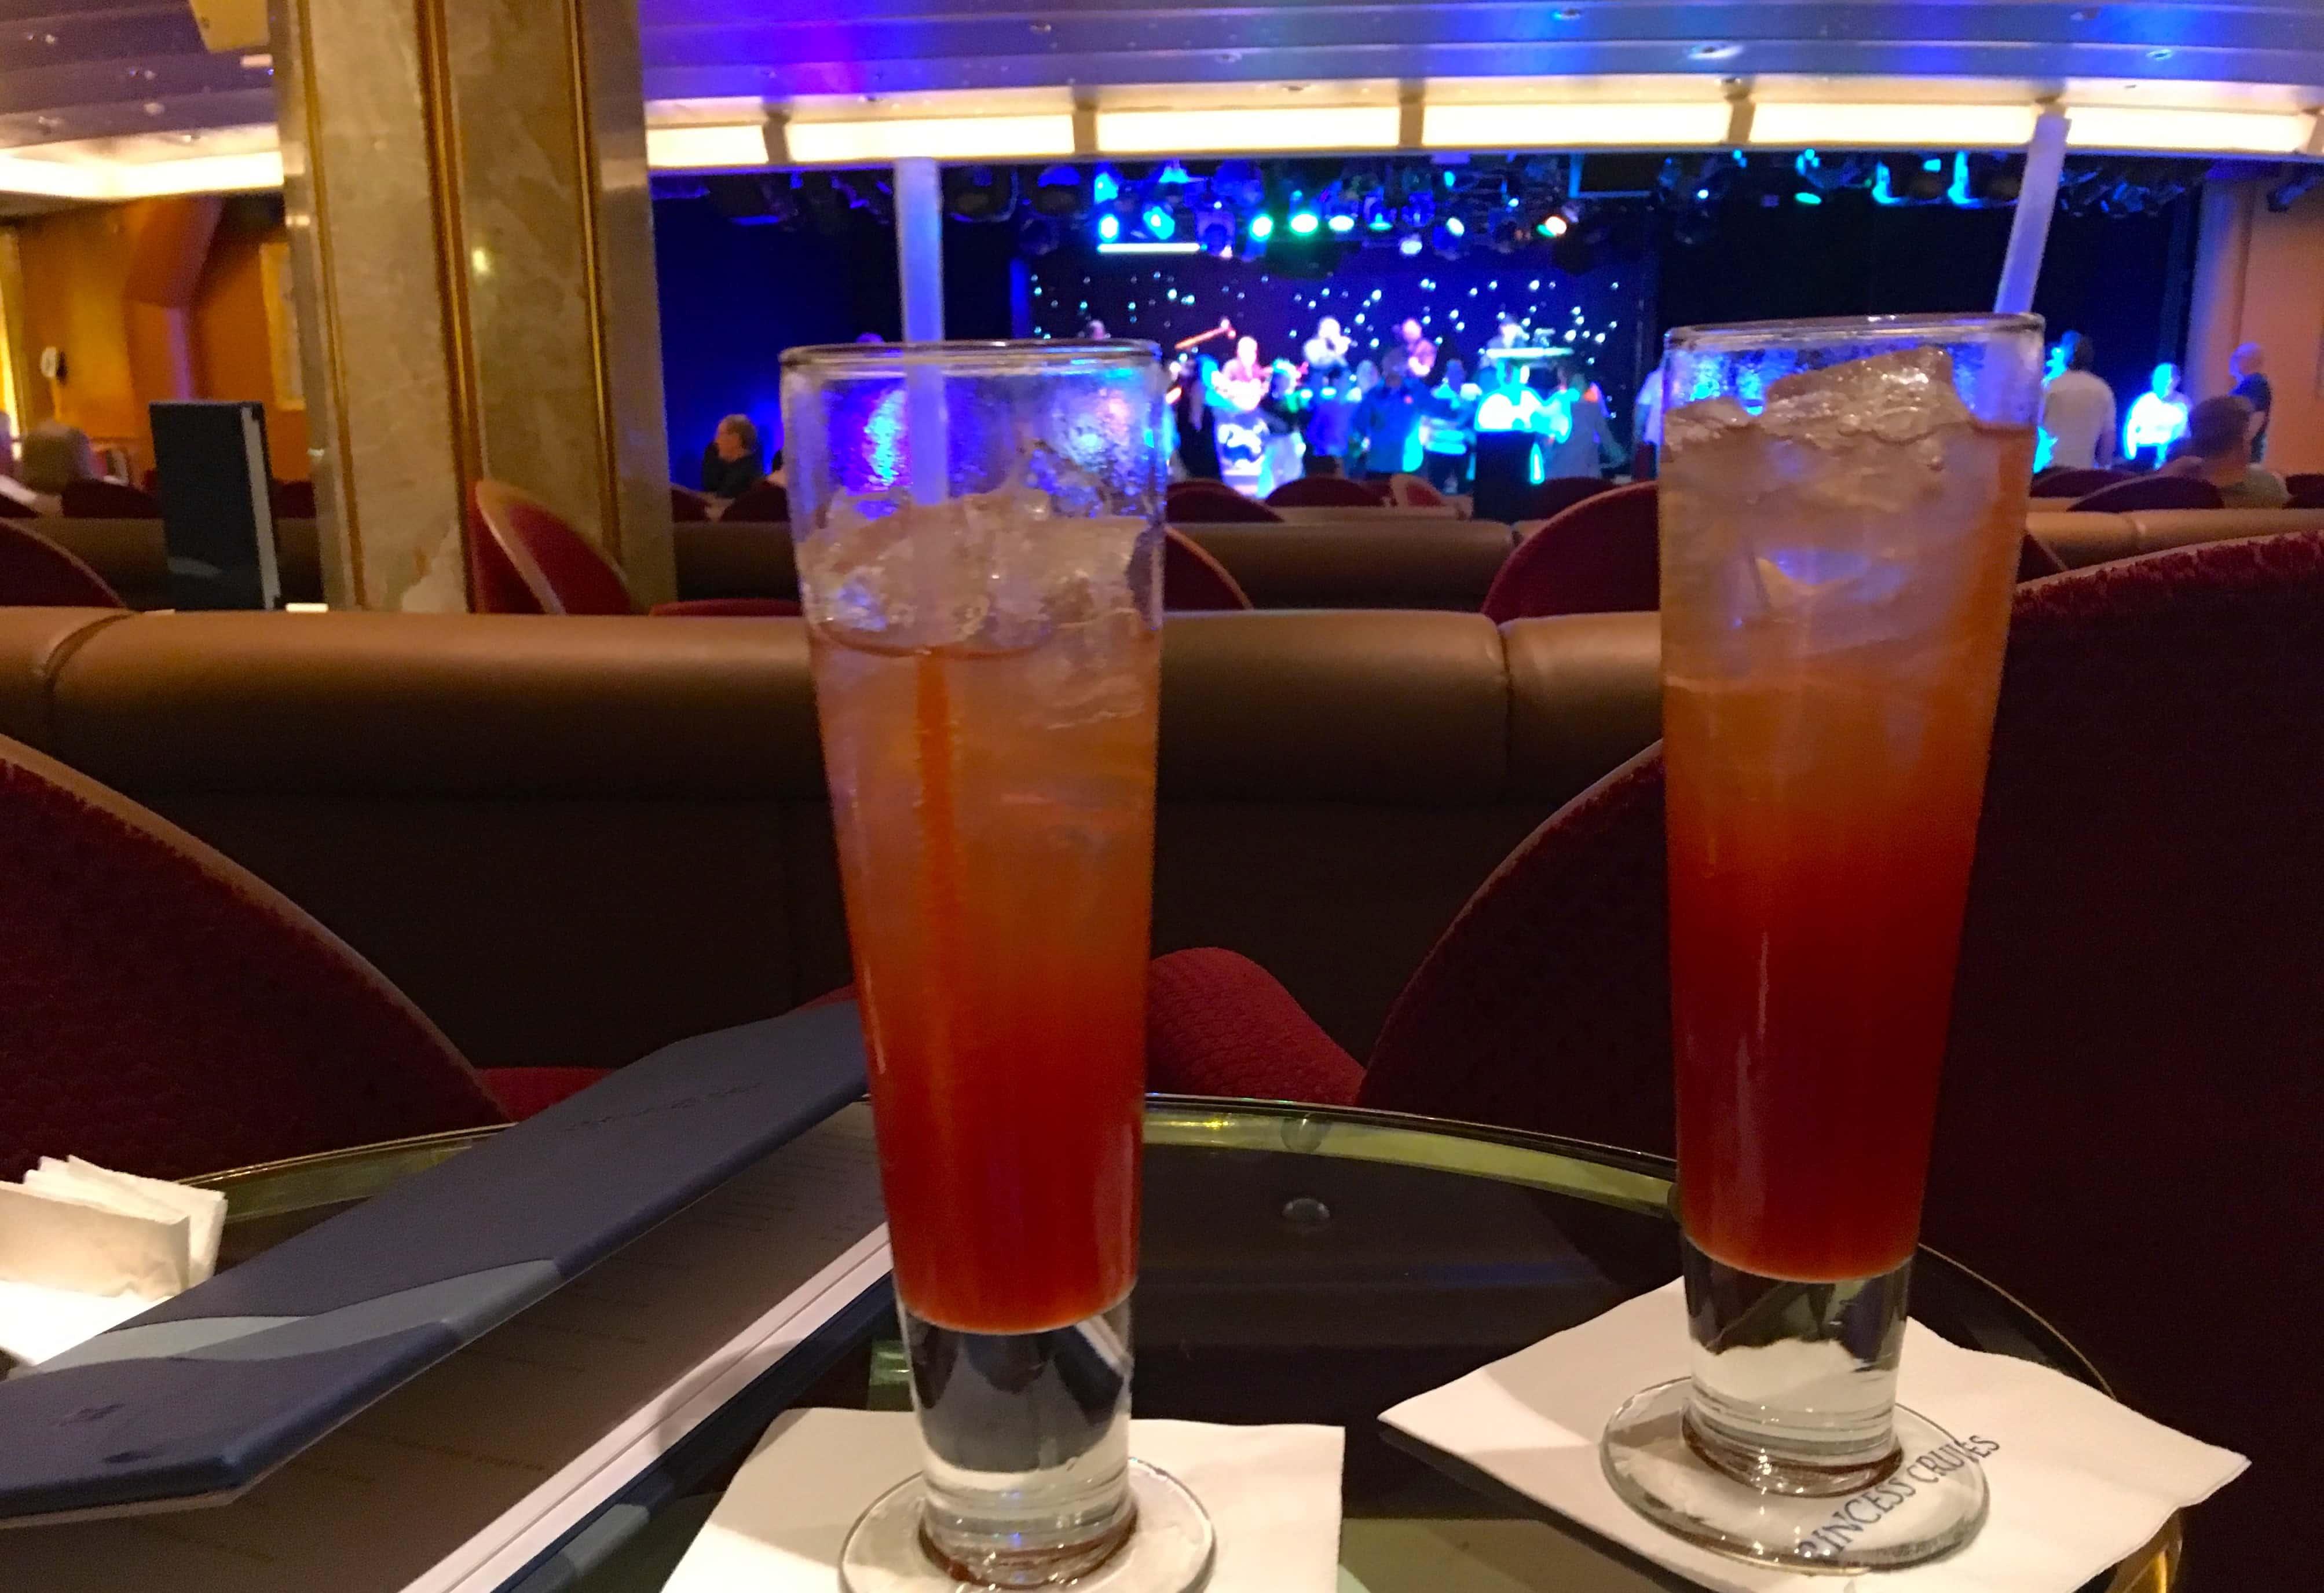 Vista Lounge Golden Princess Cruise Ship Drinks Cocktails 70s Disco